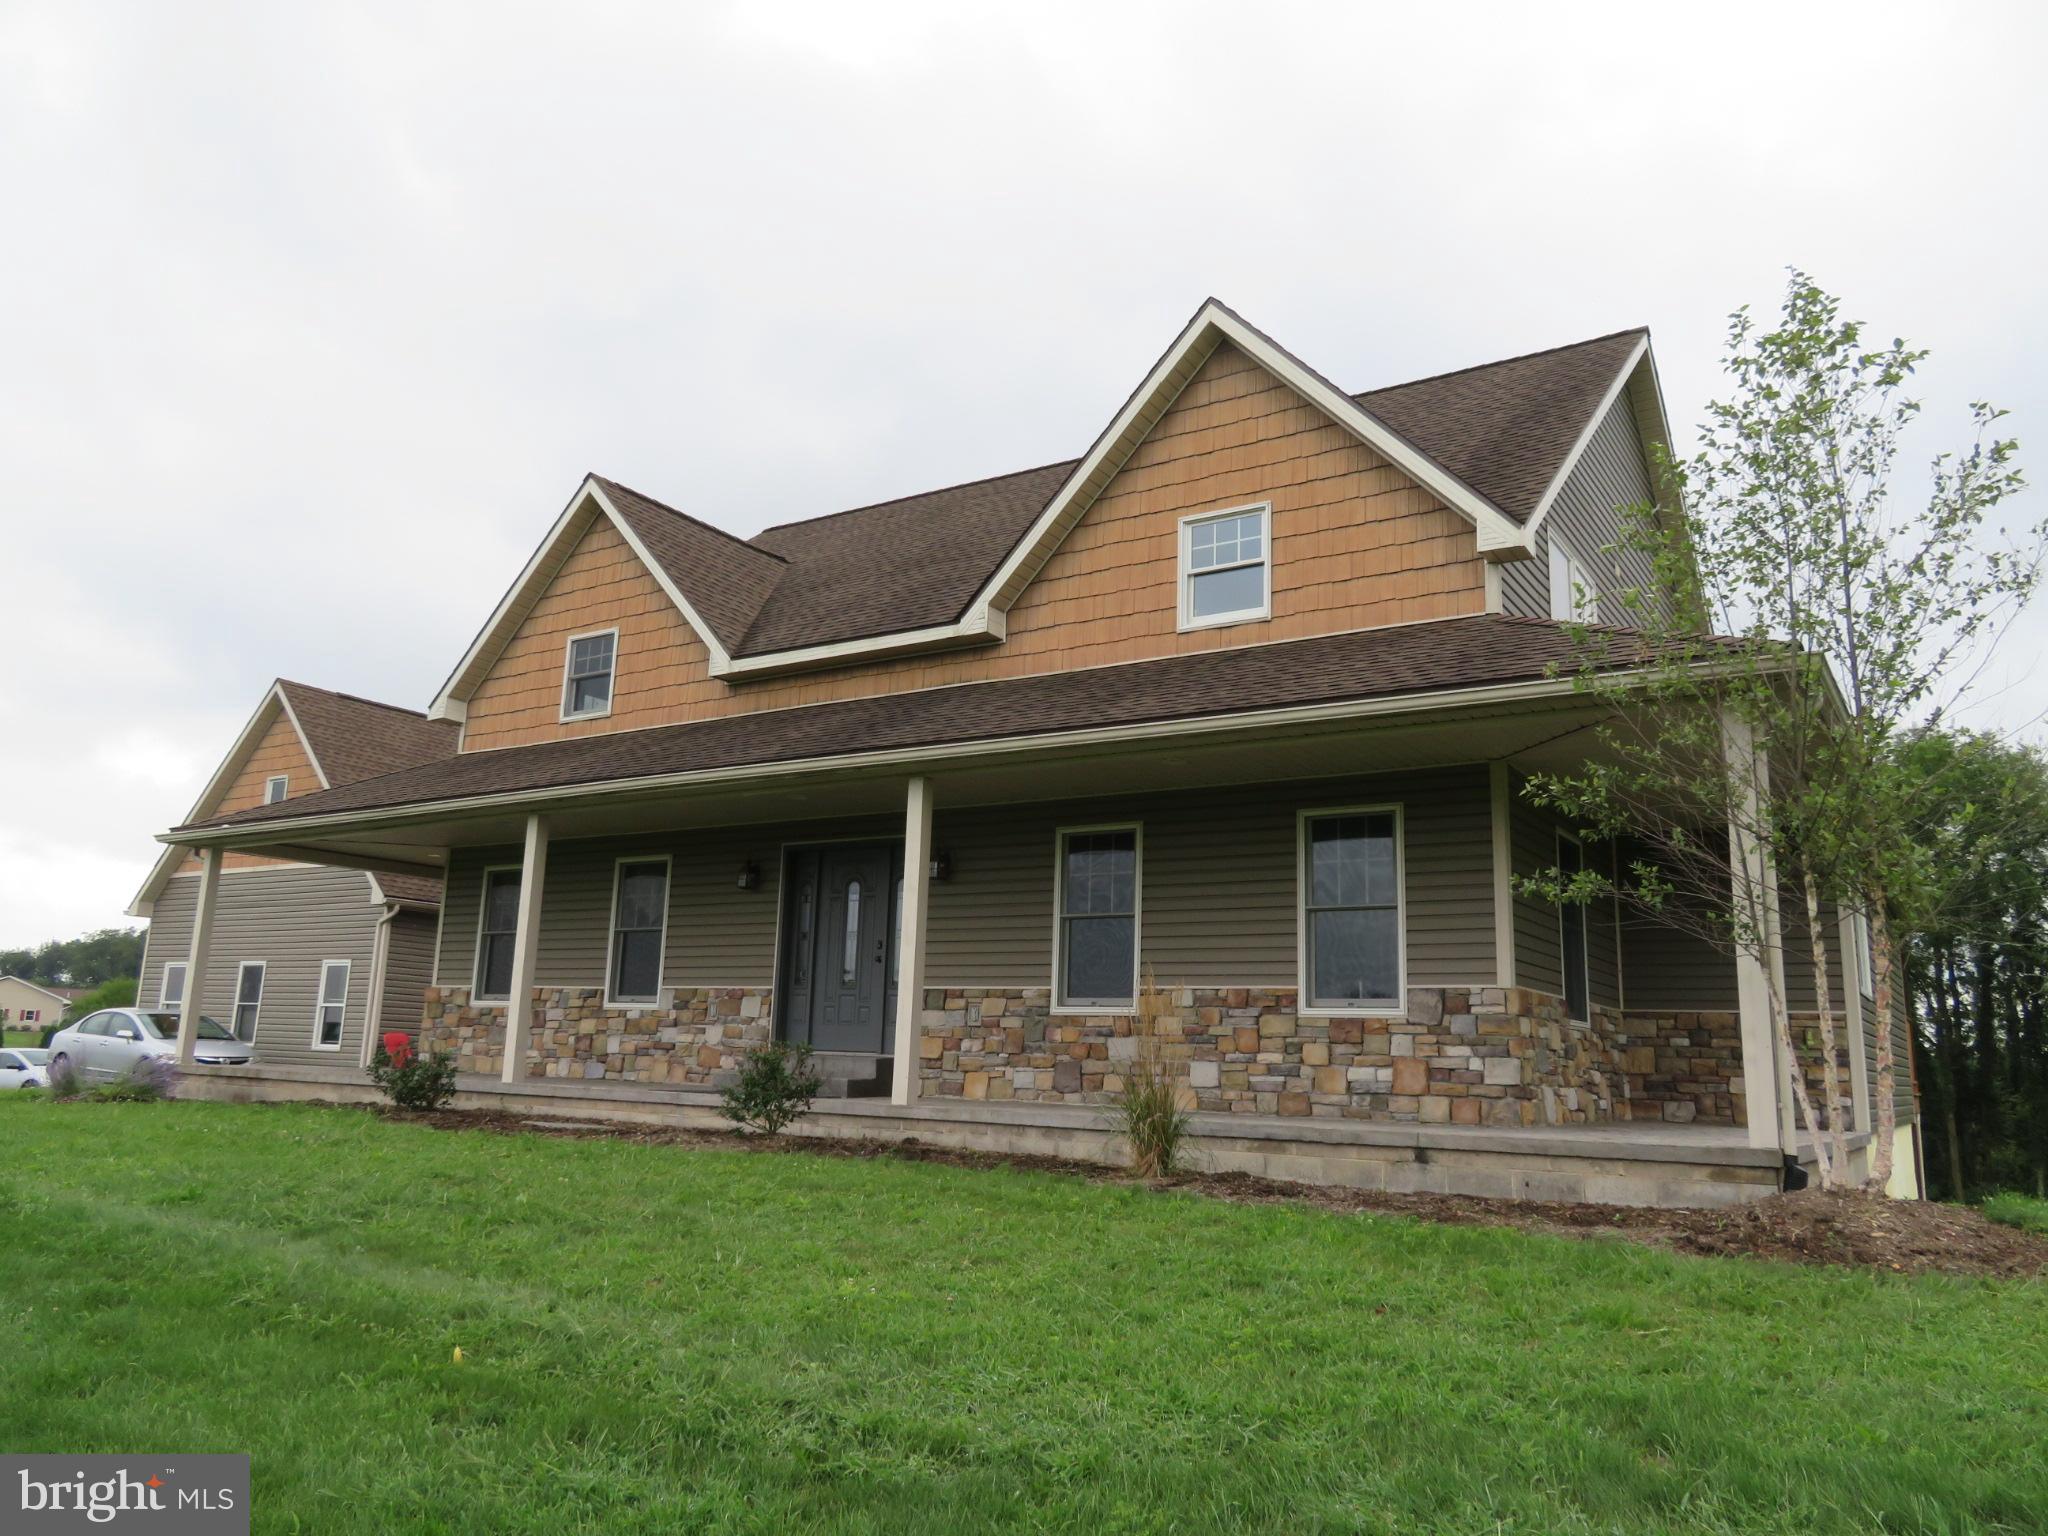 628 SCHOOL HOUSE ROAD, MILTON, PA 17847